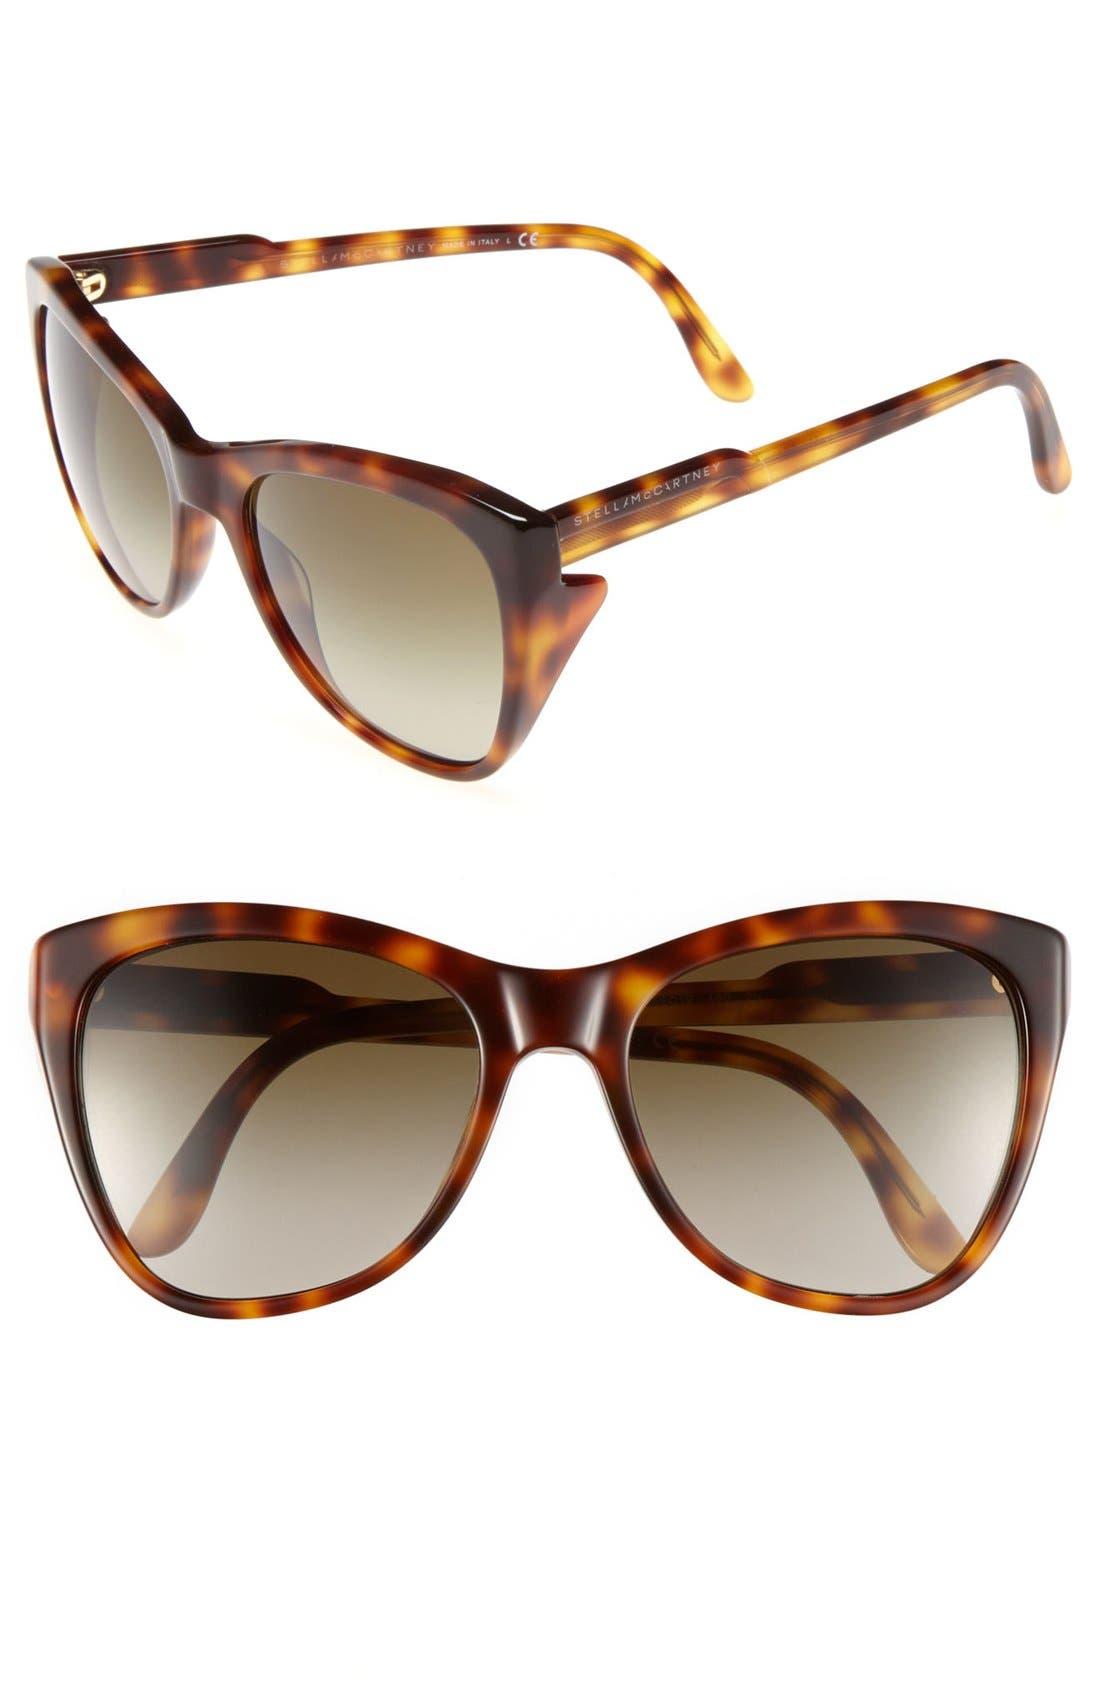 Main Image - Stella McCartney 56mm Retro Sunglasses